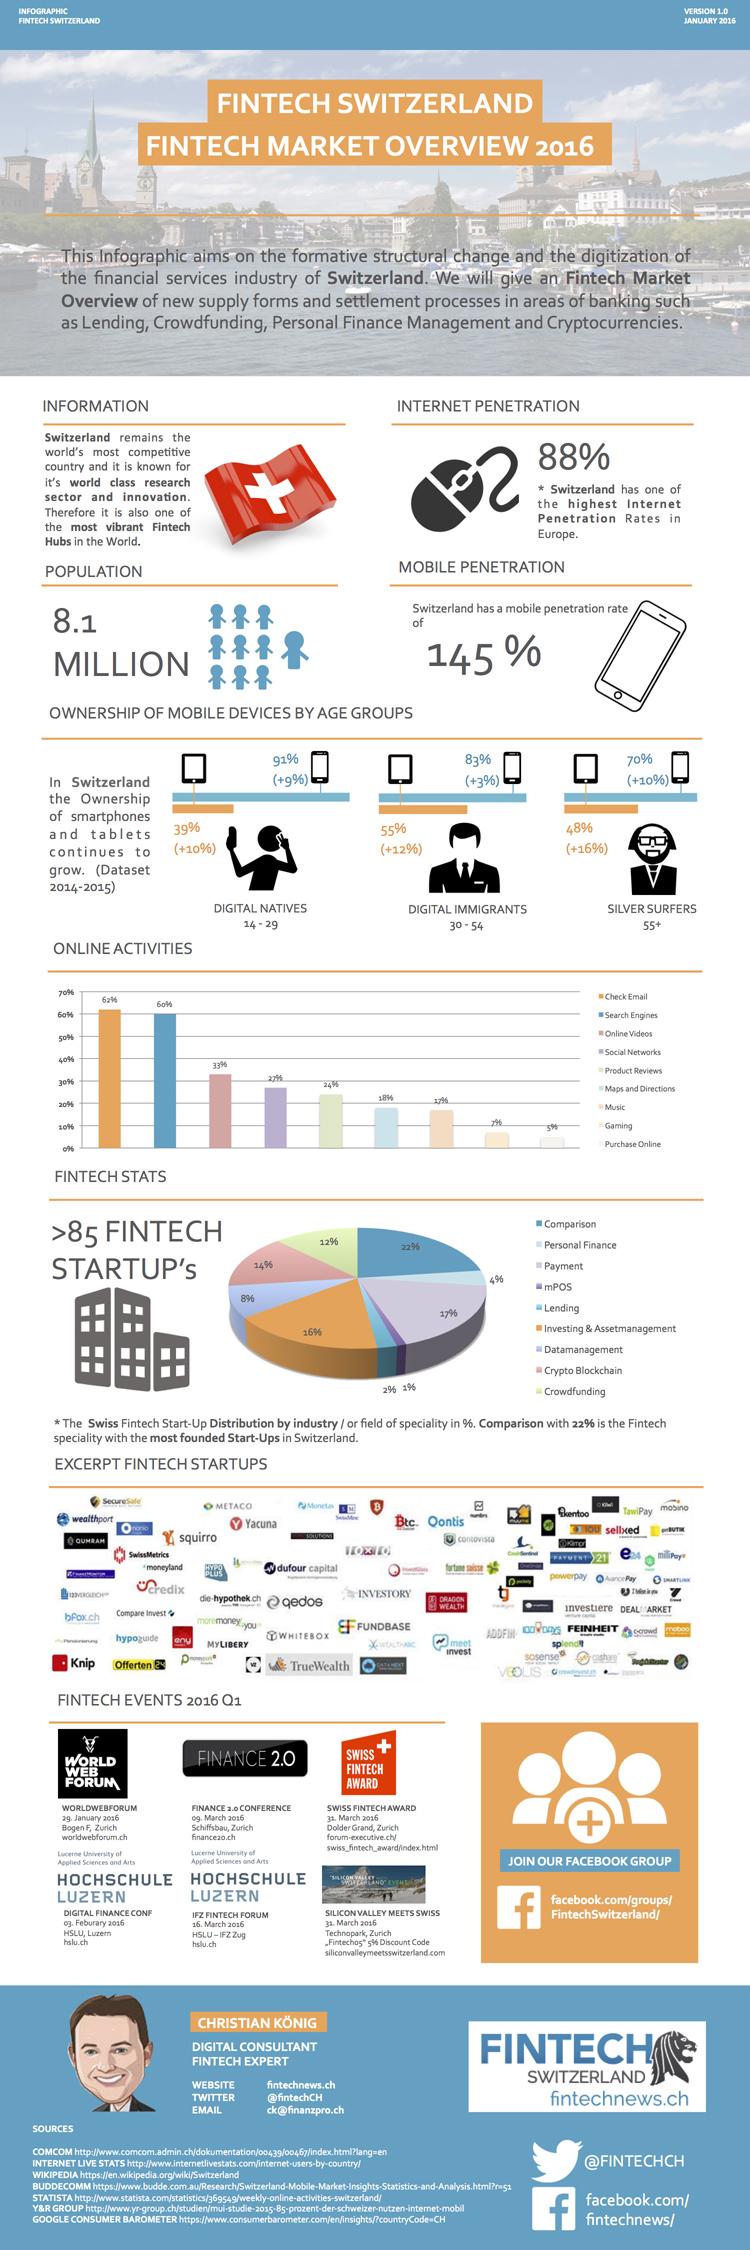 FinTech-Szene Schweiz im Überblick